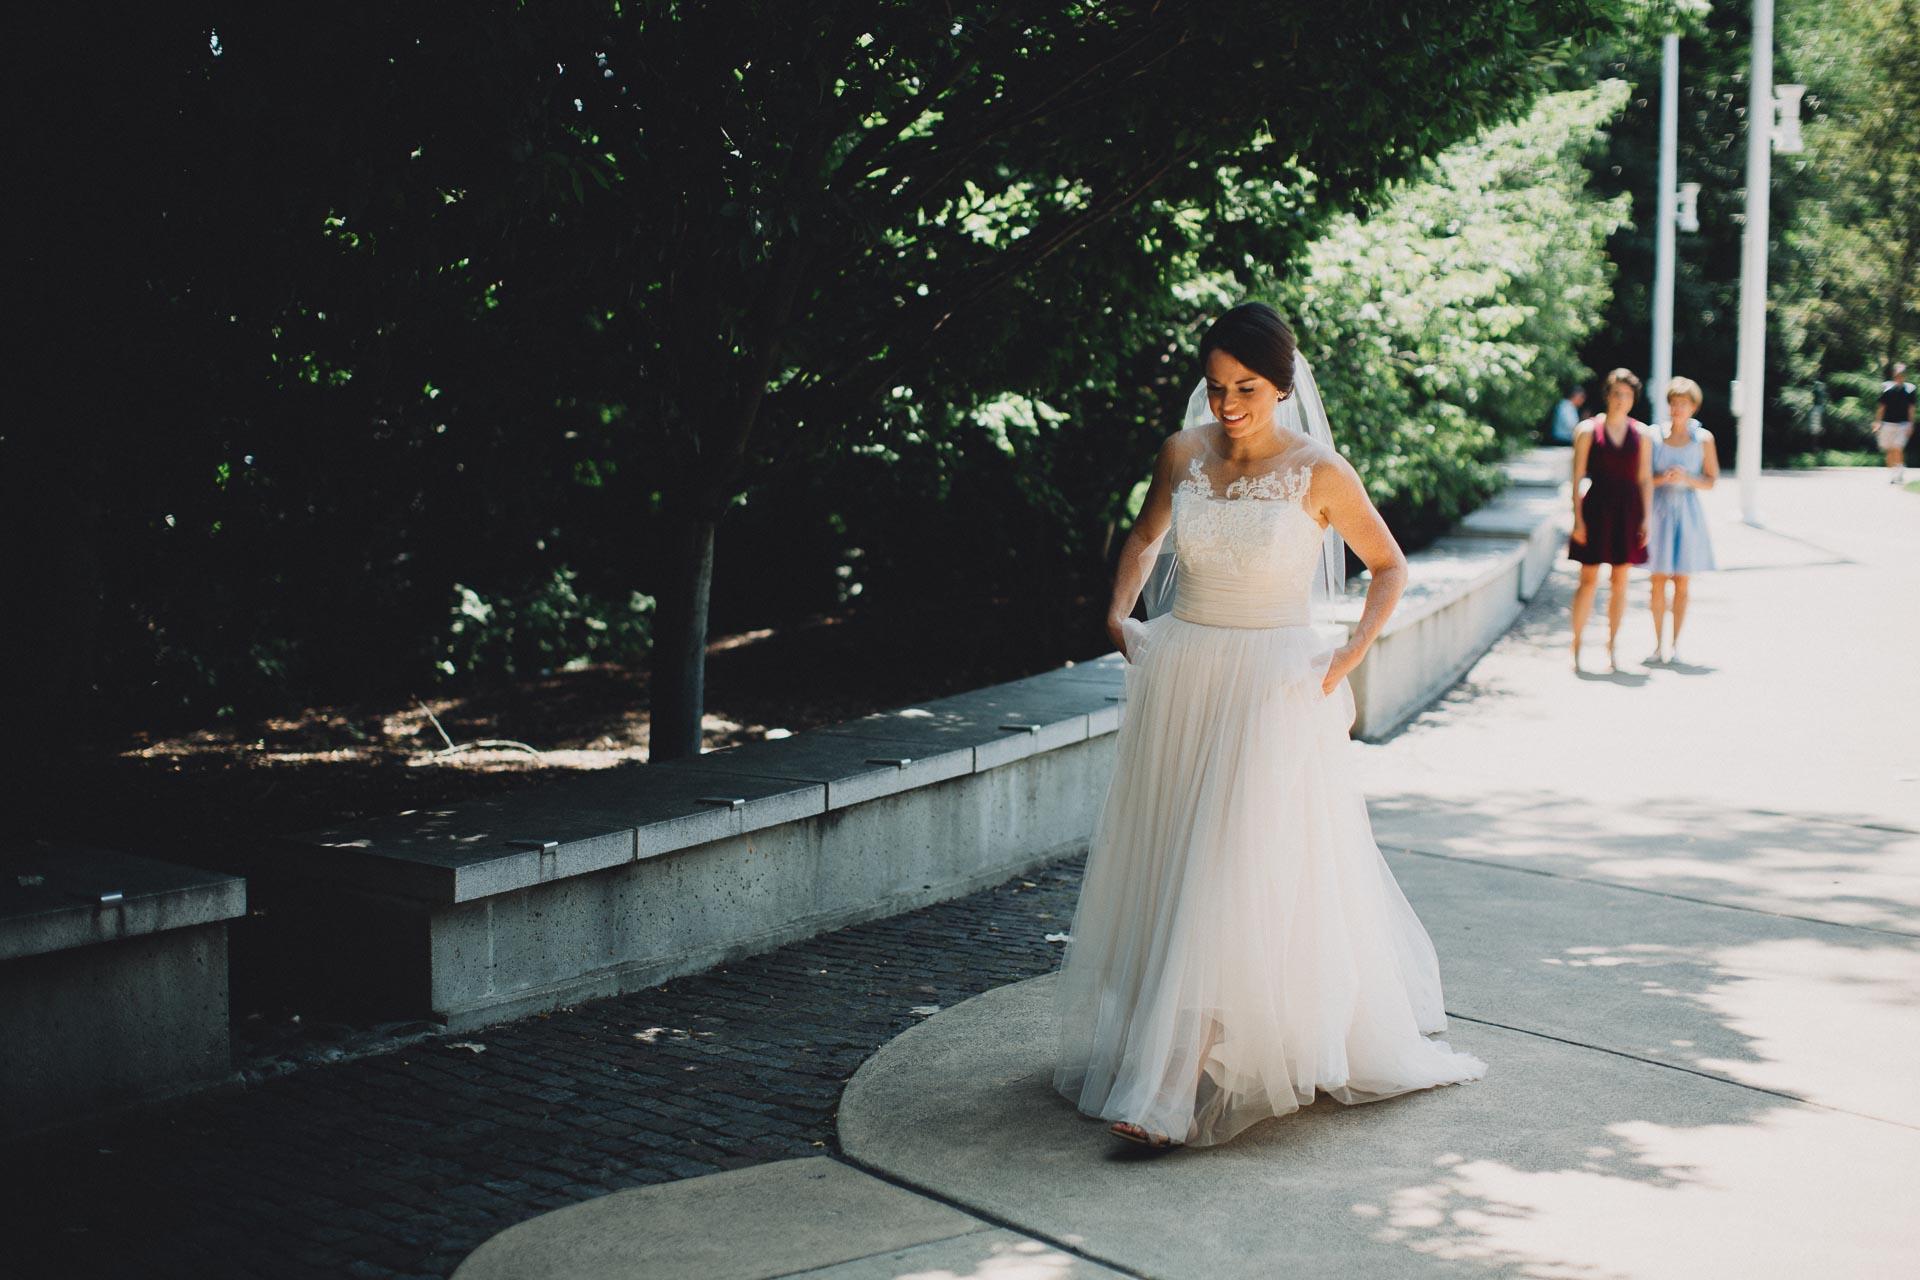 Emily-Eddie-Cincinnati-Rennaissance-Hotel-Wedding-027@2x.jpg